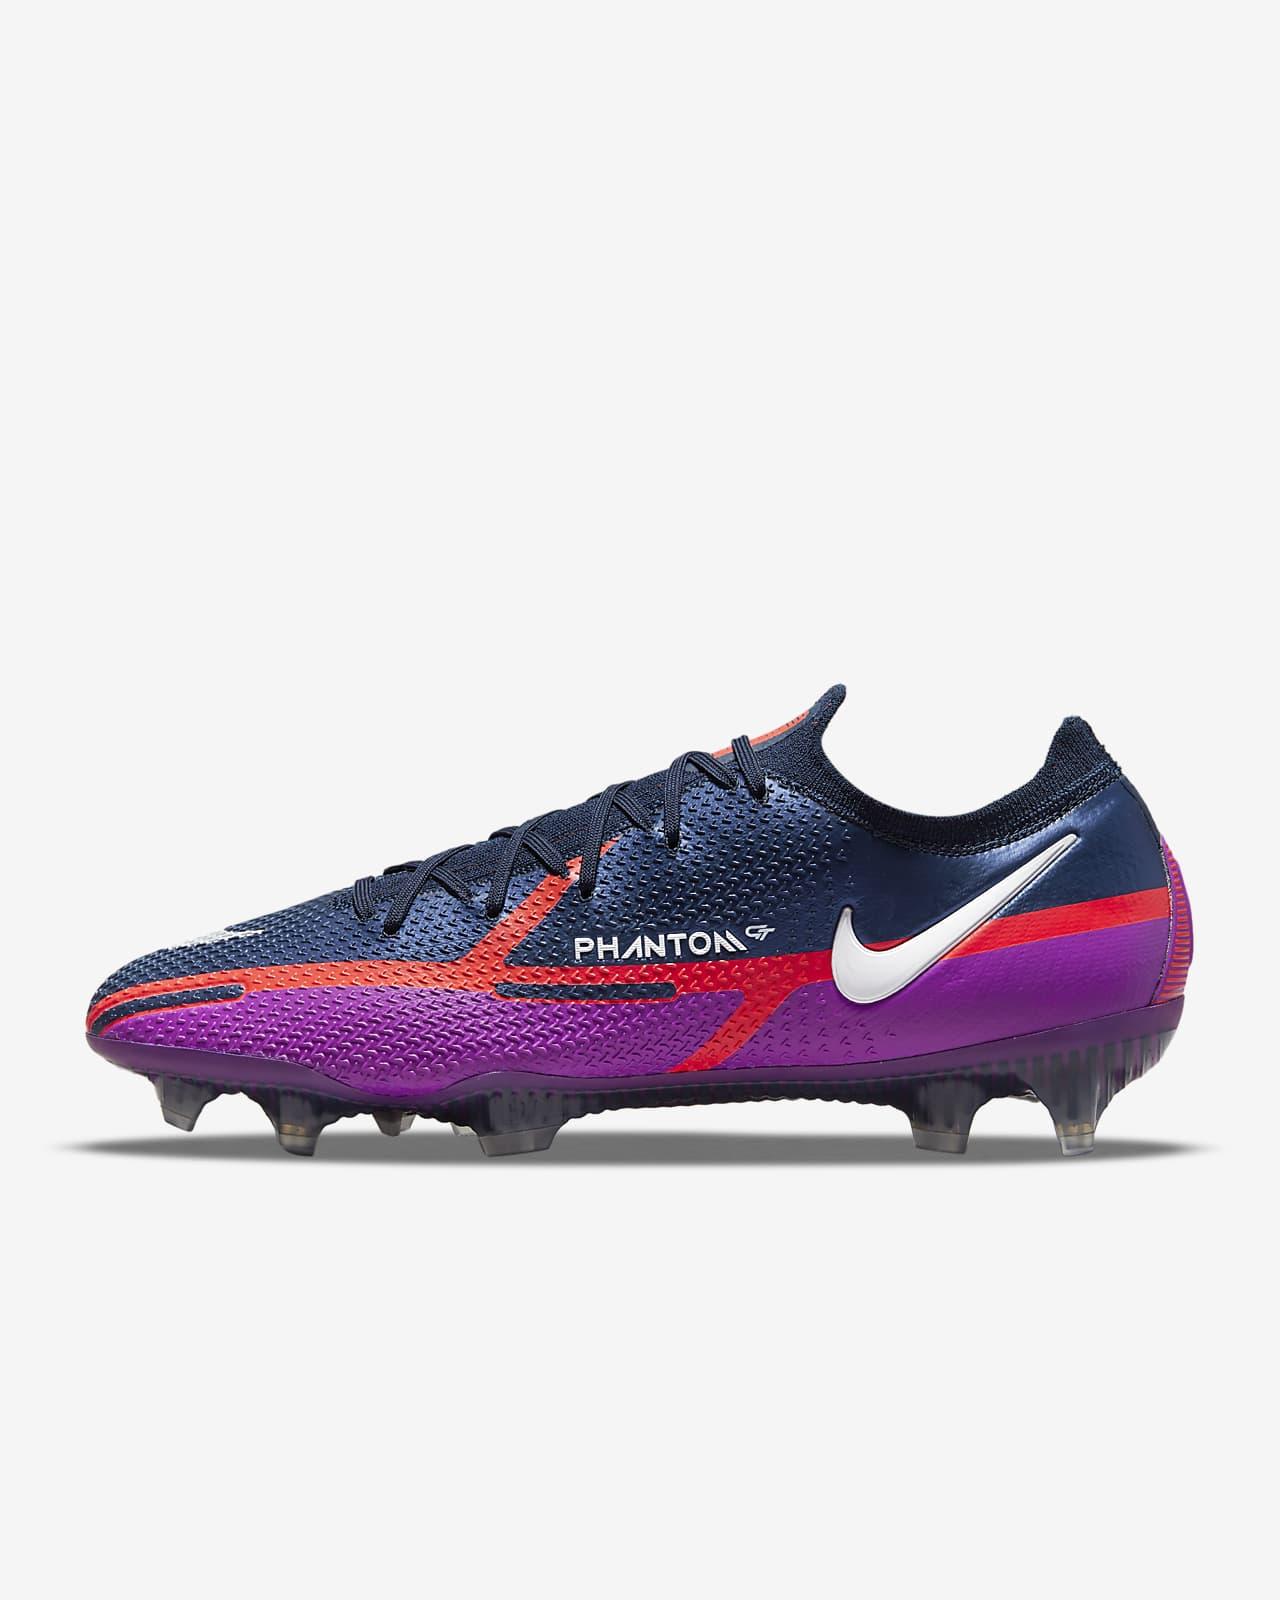 Chaussure de football à crampons pour terrain sec Nike Phantom GT2 Elite FG